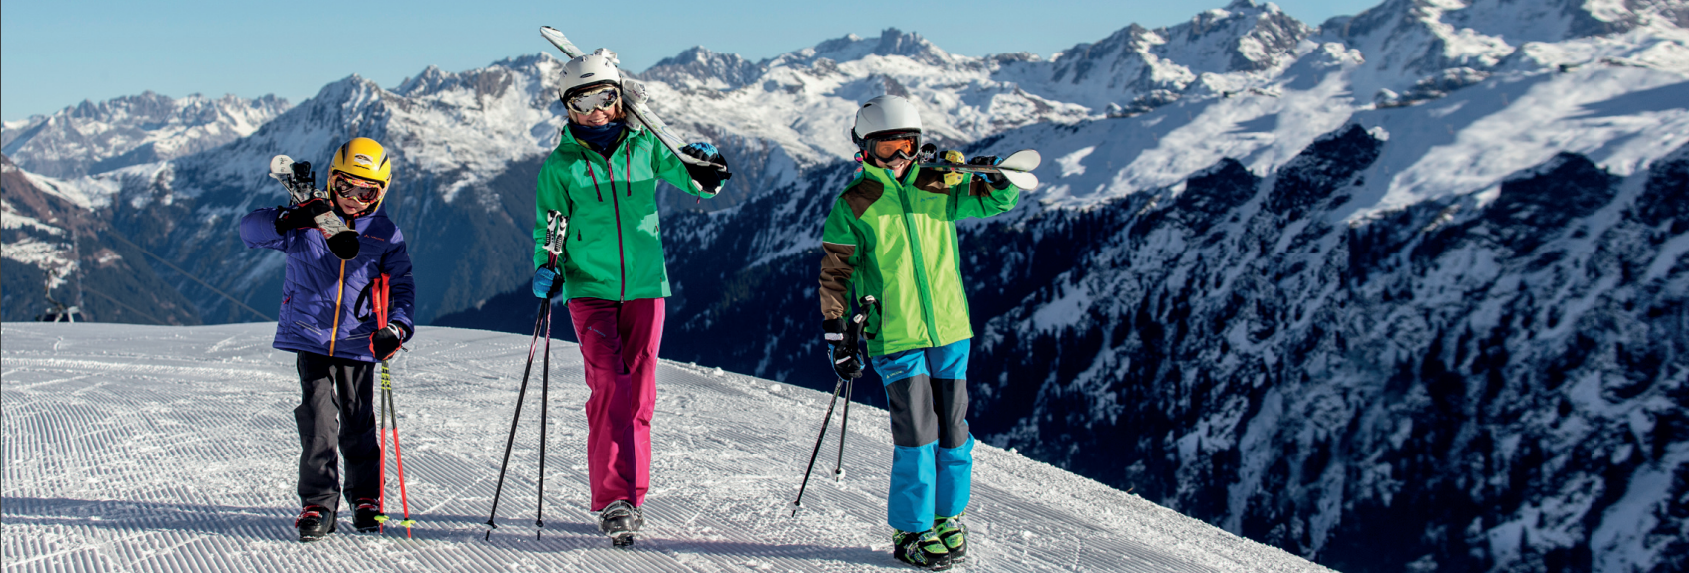 bete-ski-copii-leki-alpin